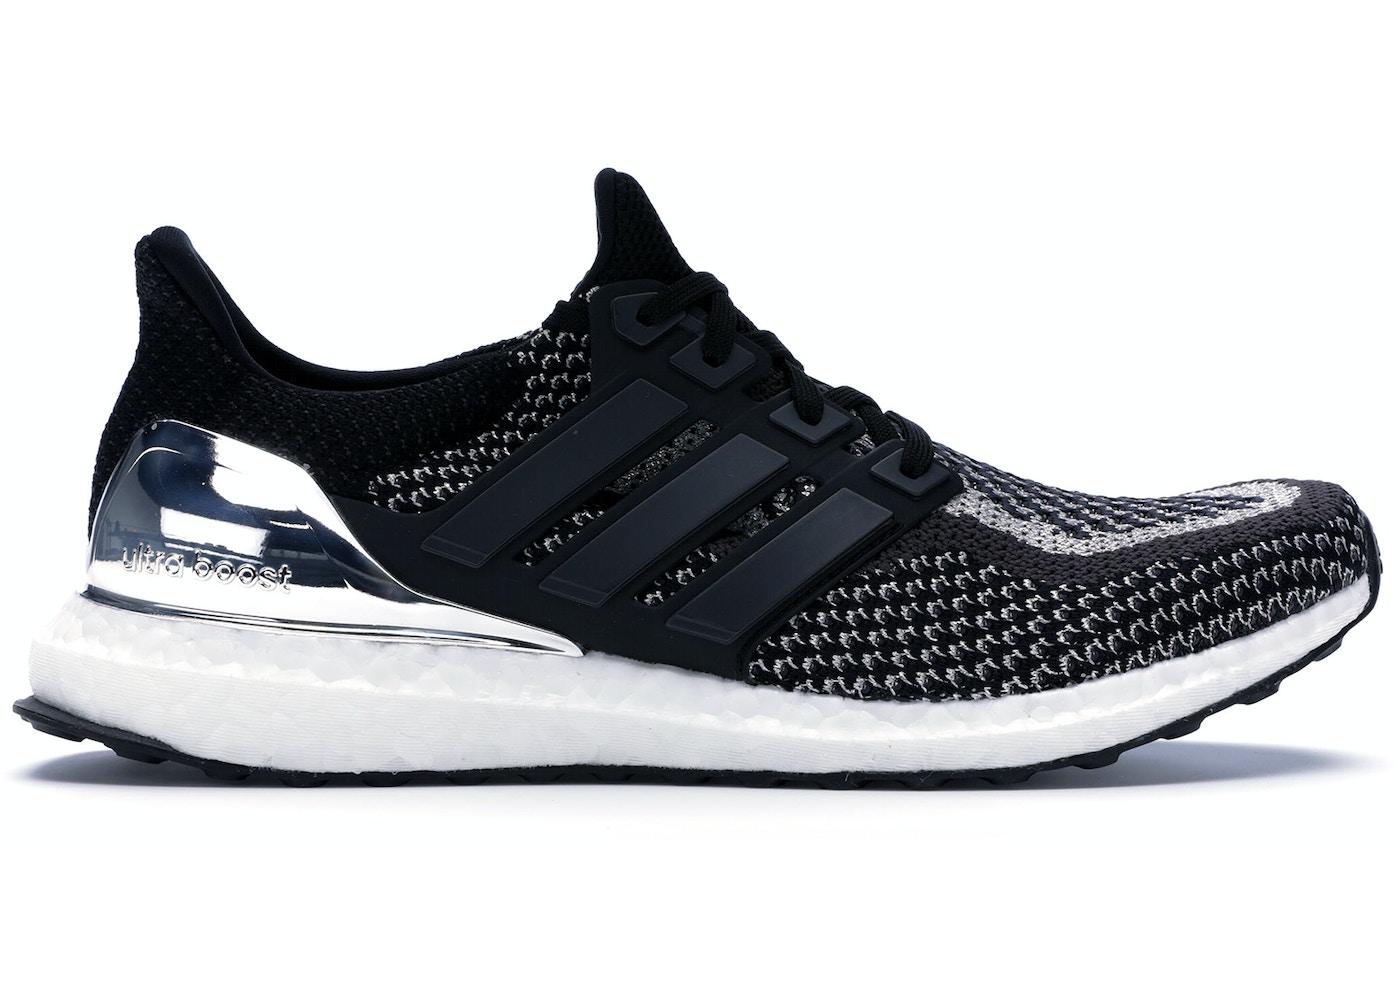 best website 82c42 037e3 Buy adidas Ultra Boost 2.0 Shoes & Deadstock Sneakers